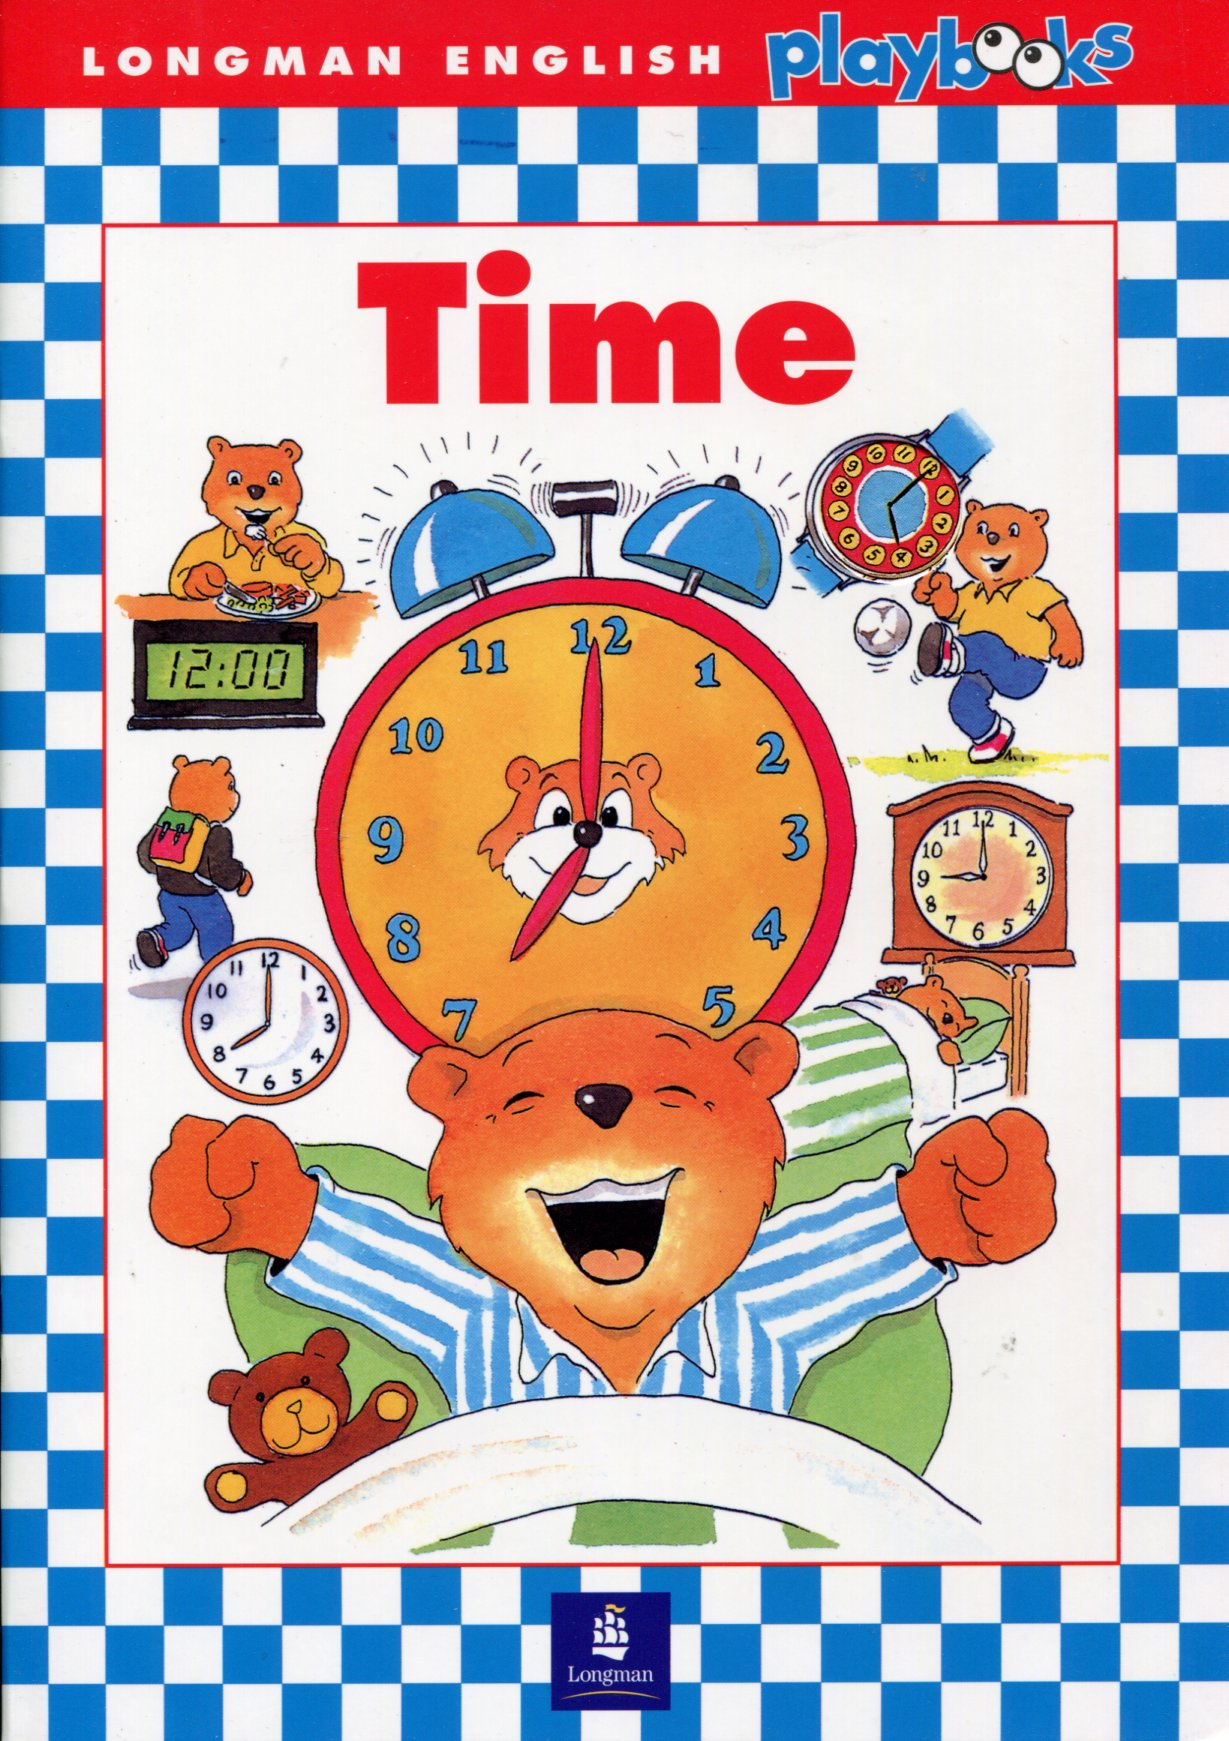 Longman English Playbooks: Time